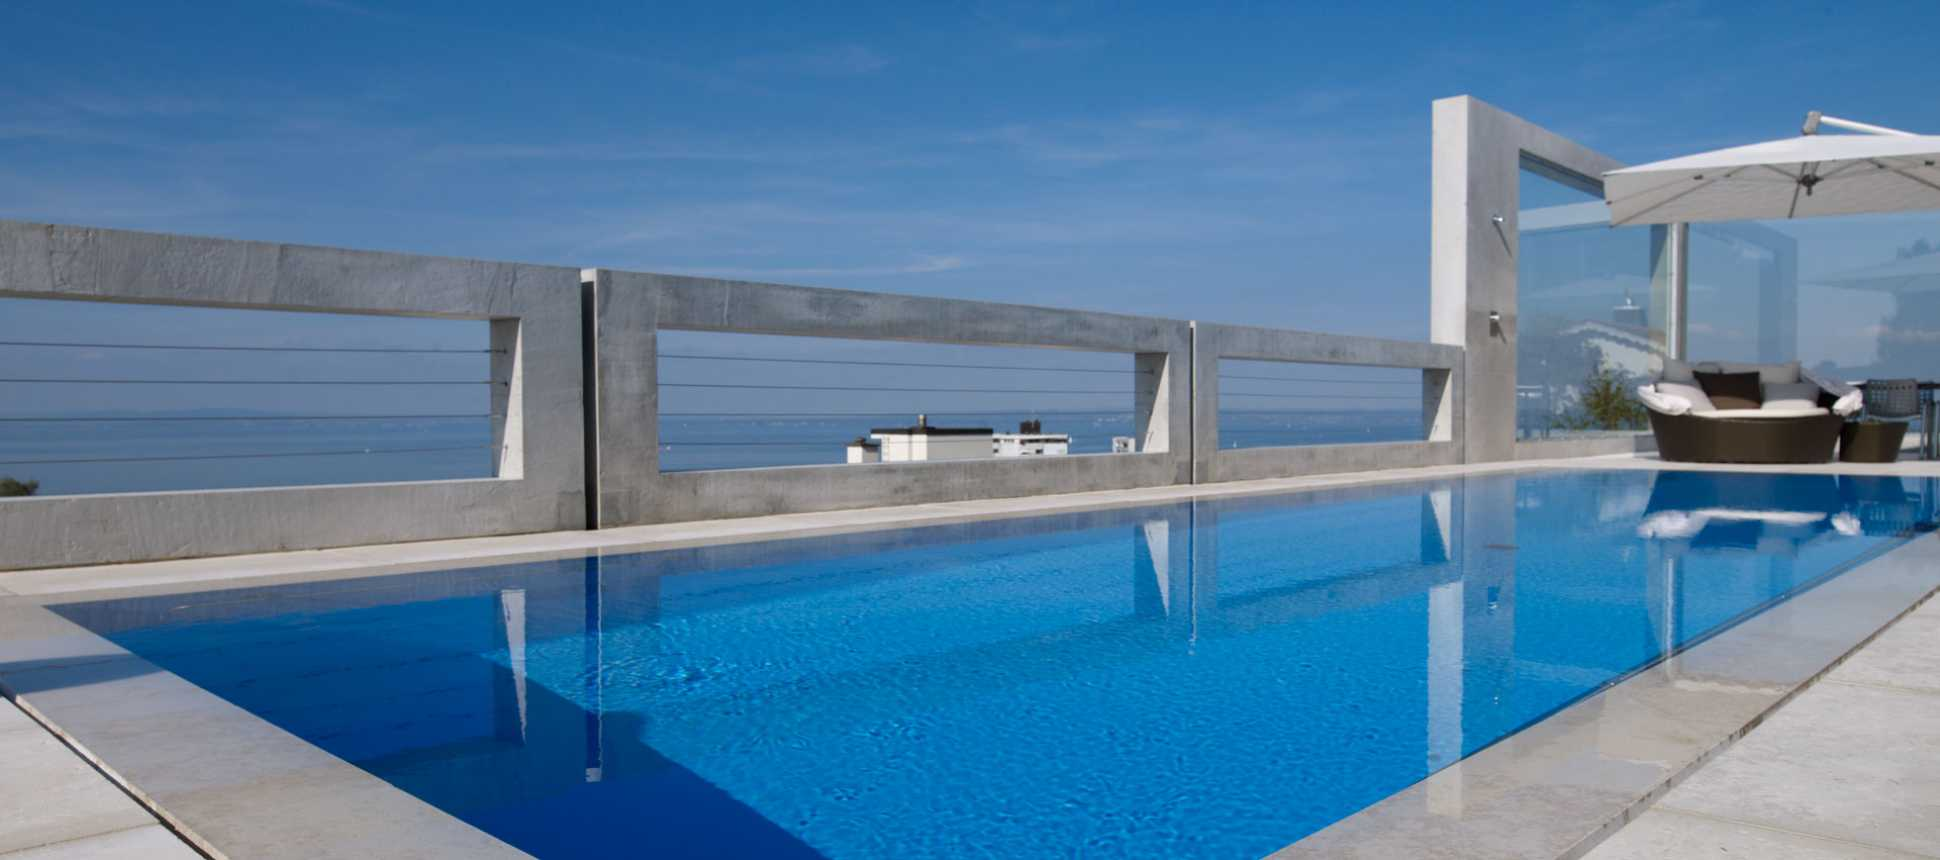 Swimmingpool mit Aussicht